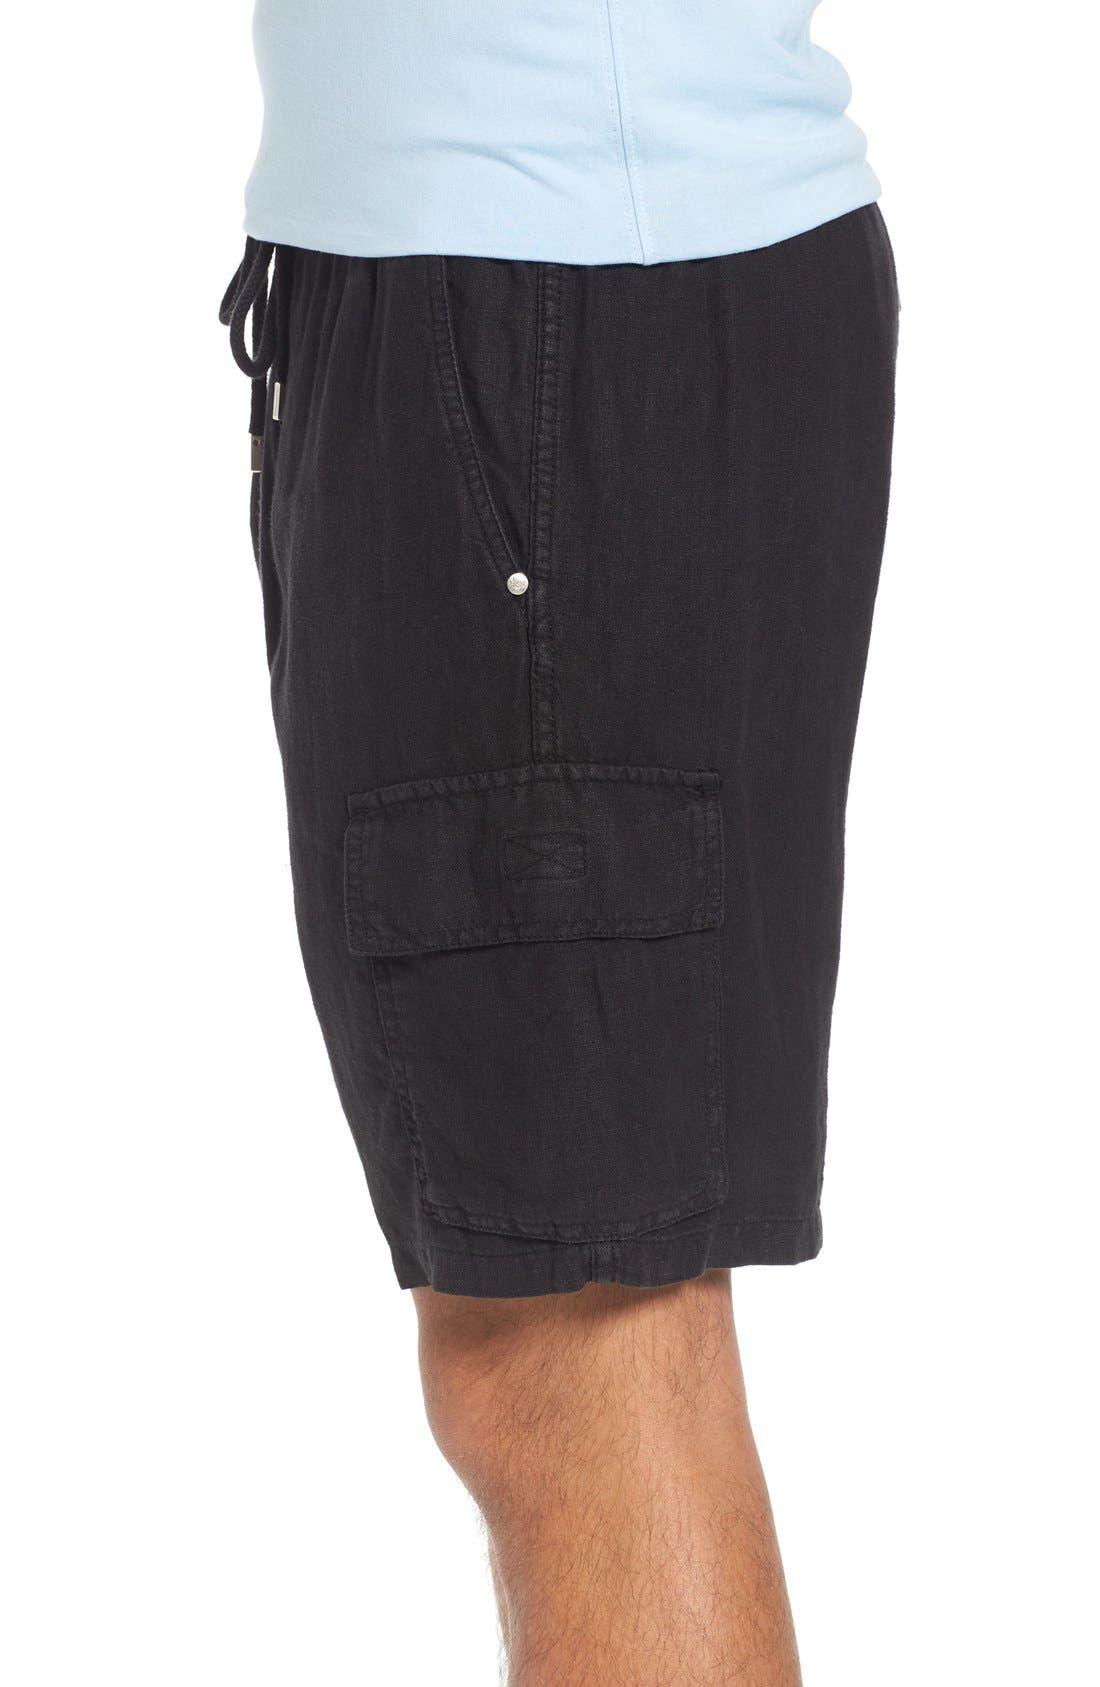 Vilbrequin Linen Cargo Shorts,                             Alternate thumbnail 3, color,                             001